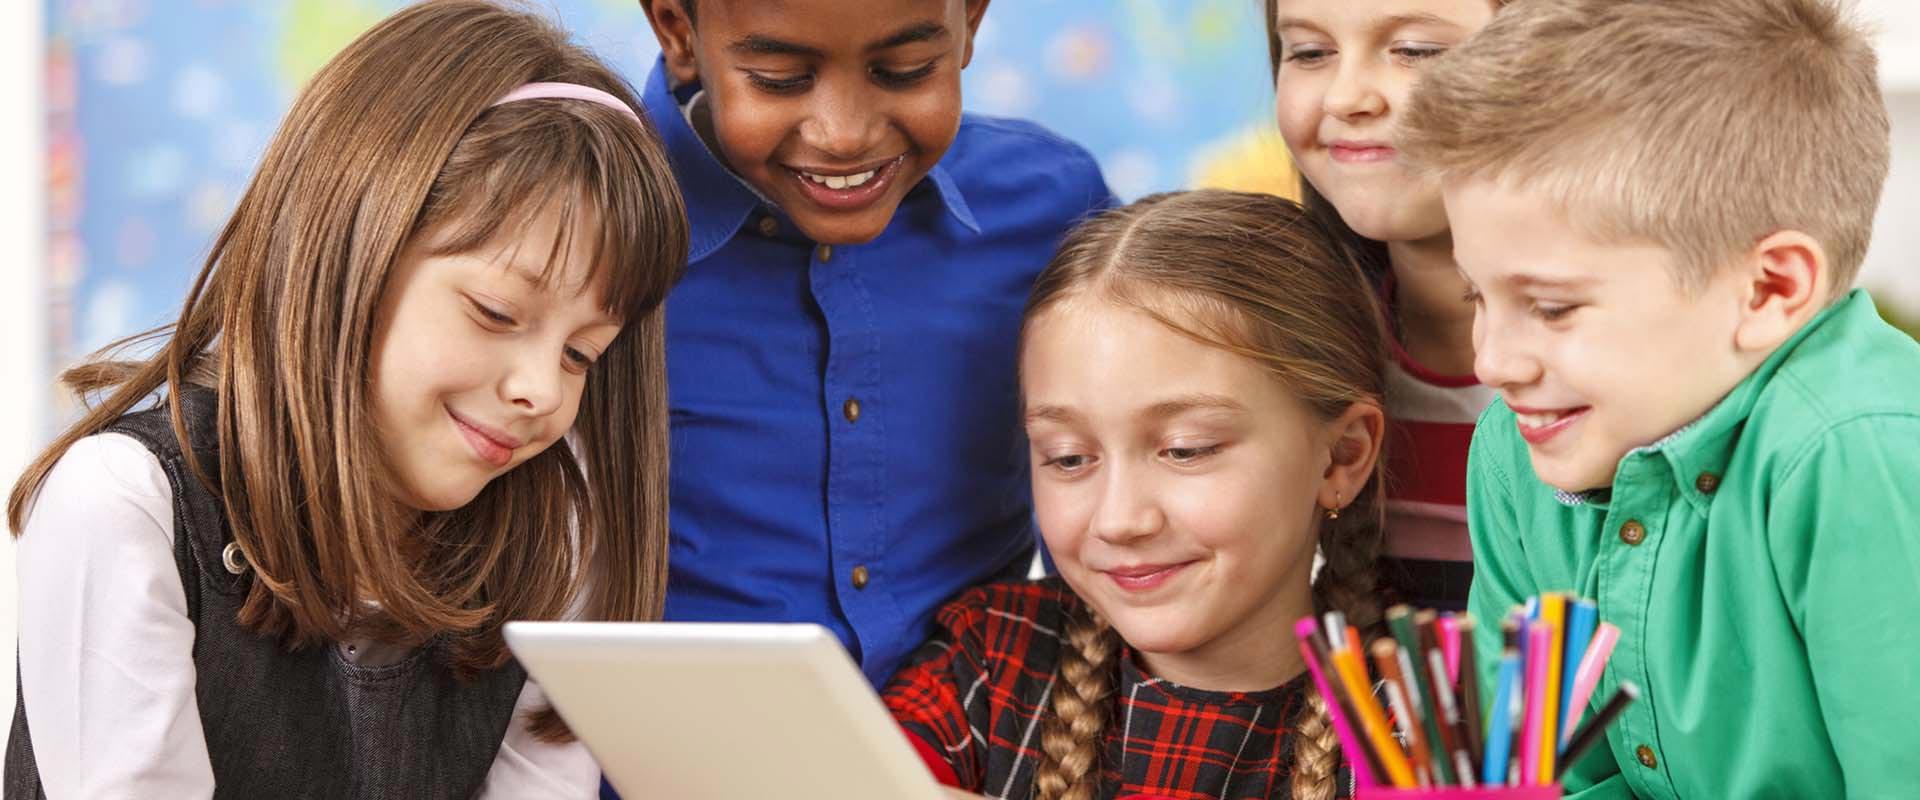 Glen Lake Community Schools Calendar 2020 - Publicholidays throughout Lake 0Rion 2022 2023 School Calendar